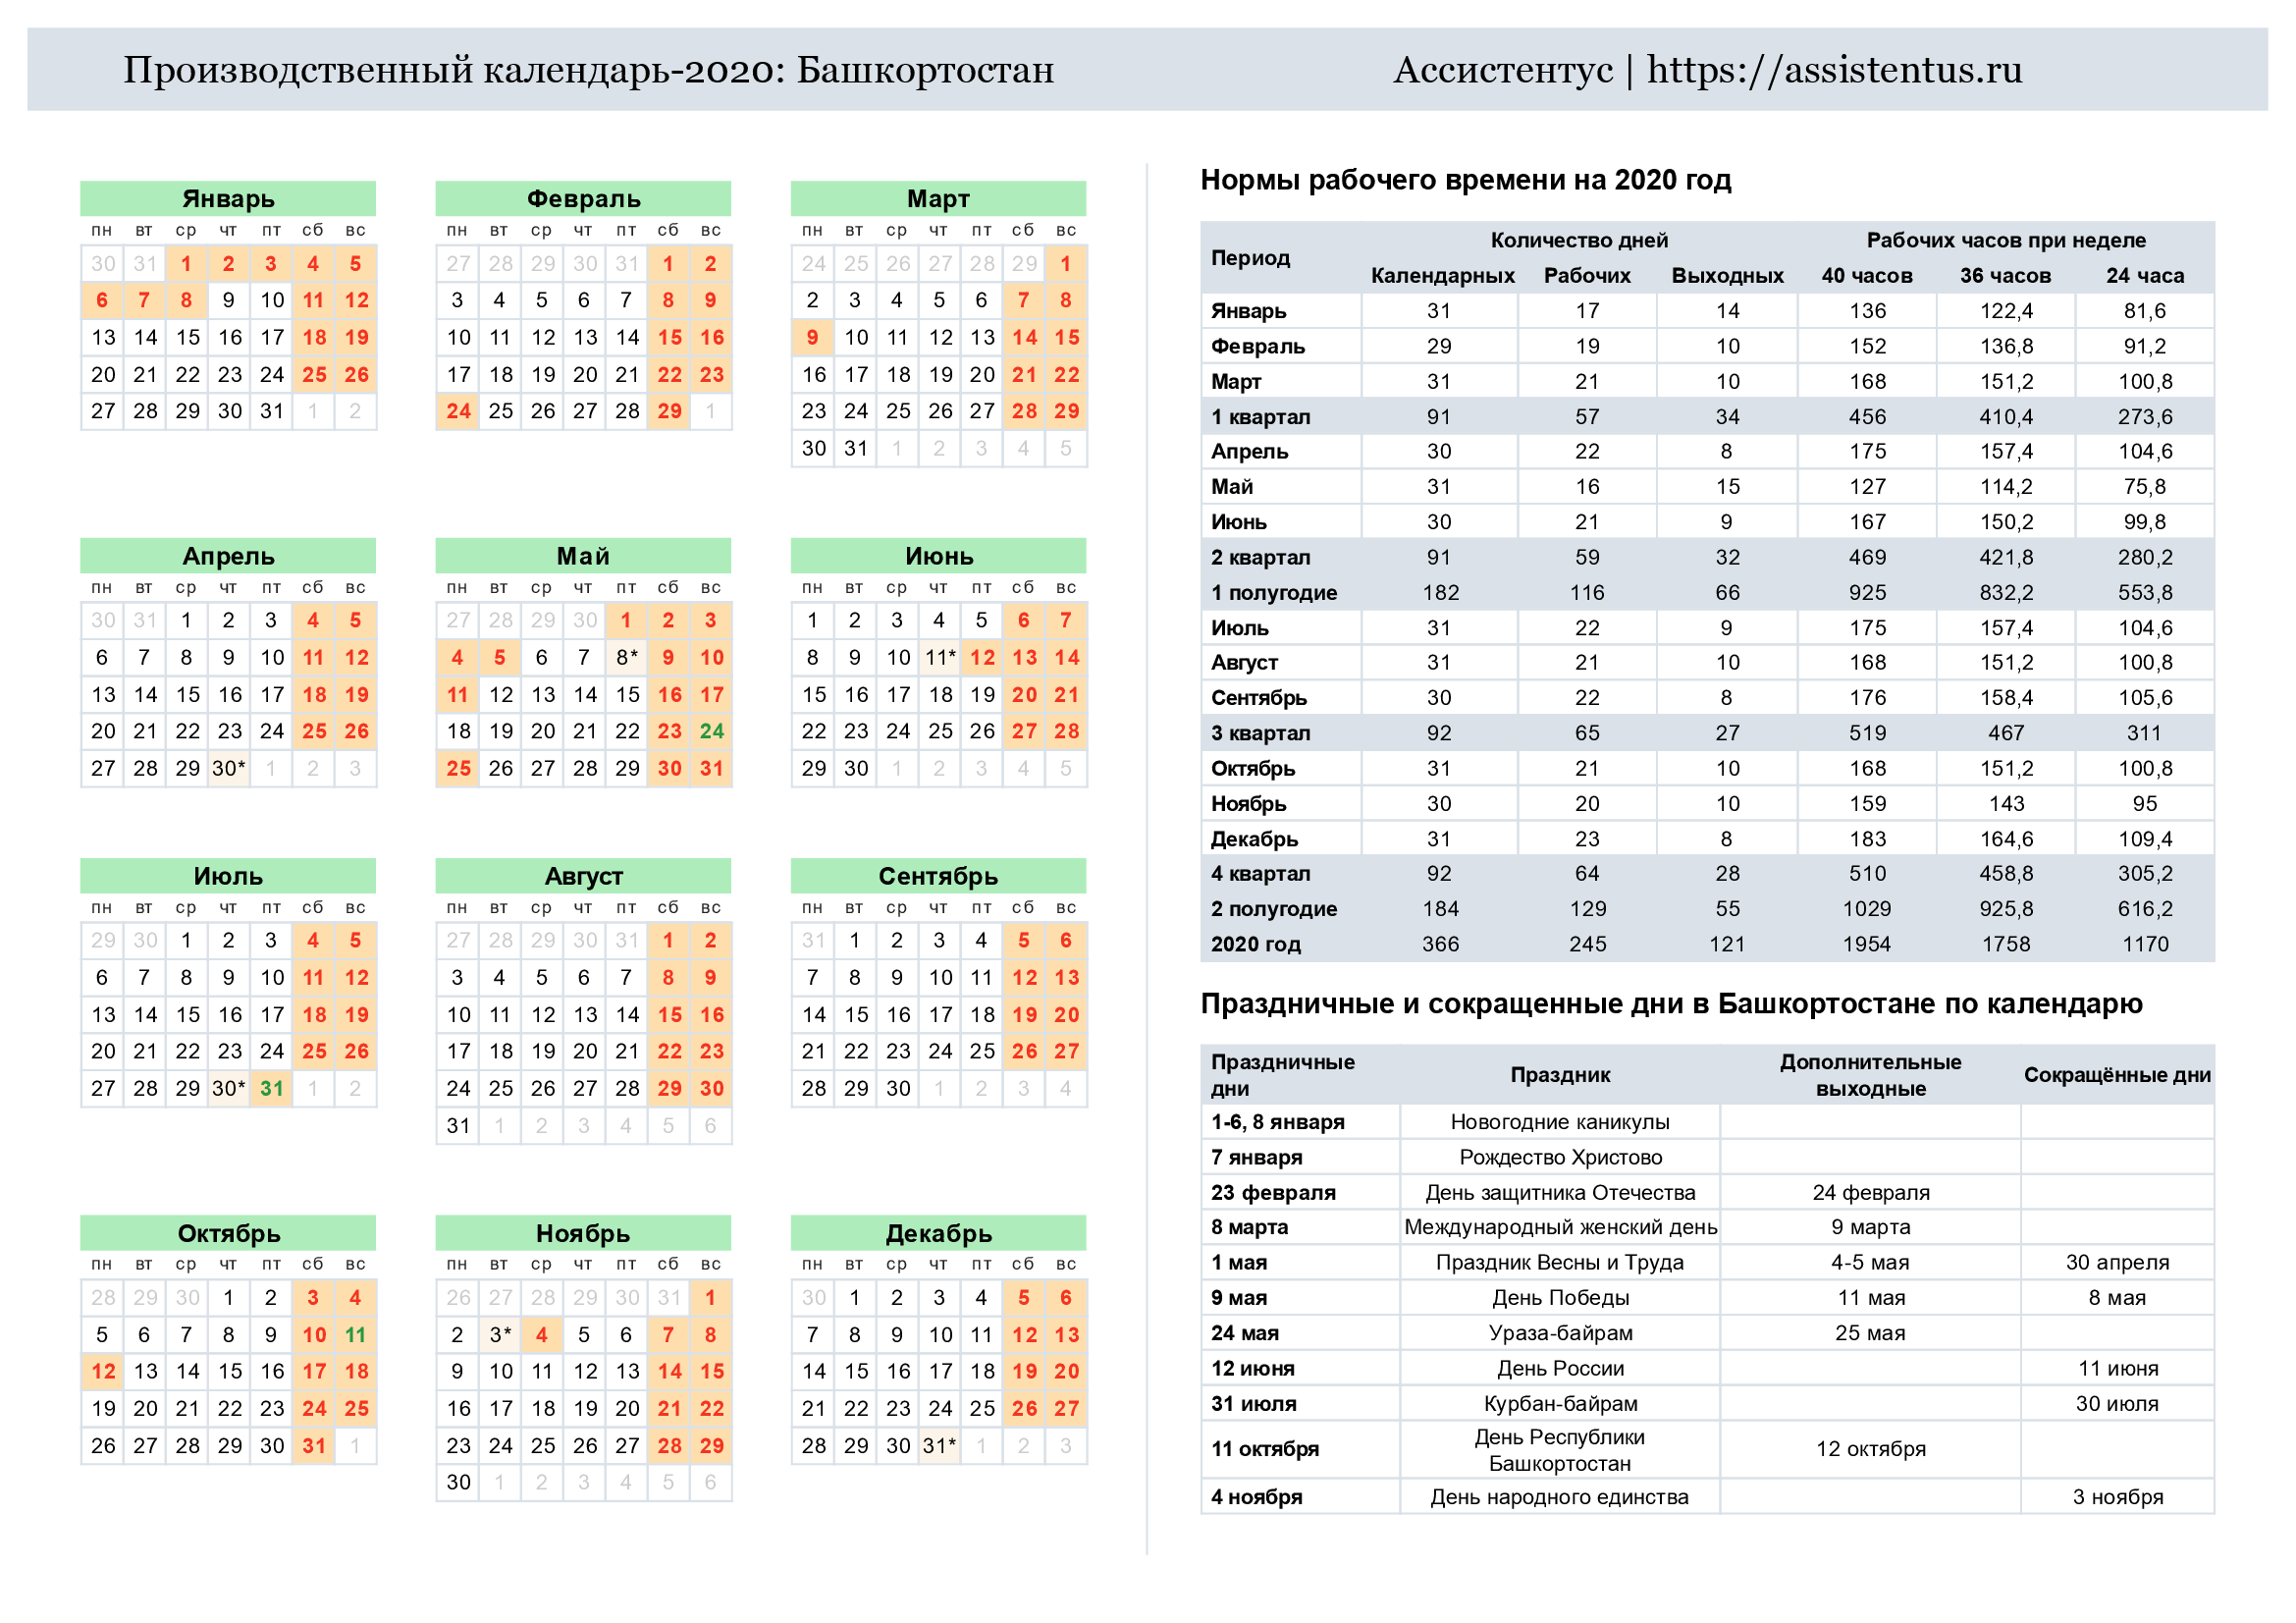 Производственный календарь 2020, Башкортостан